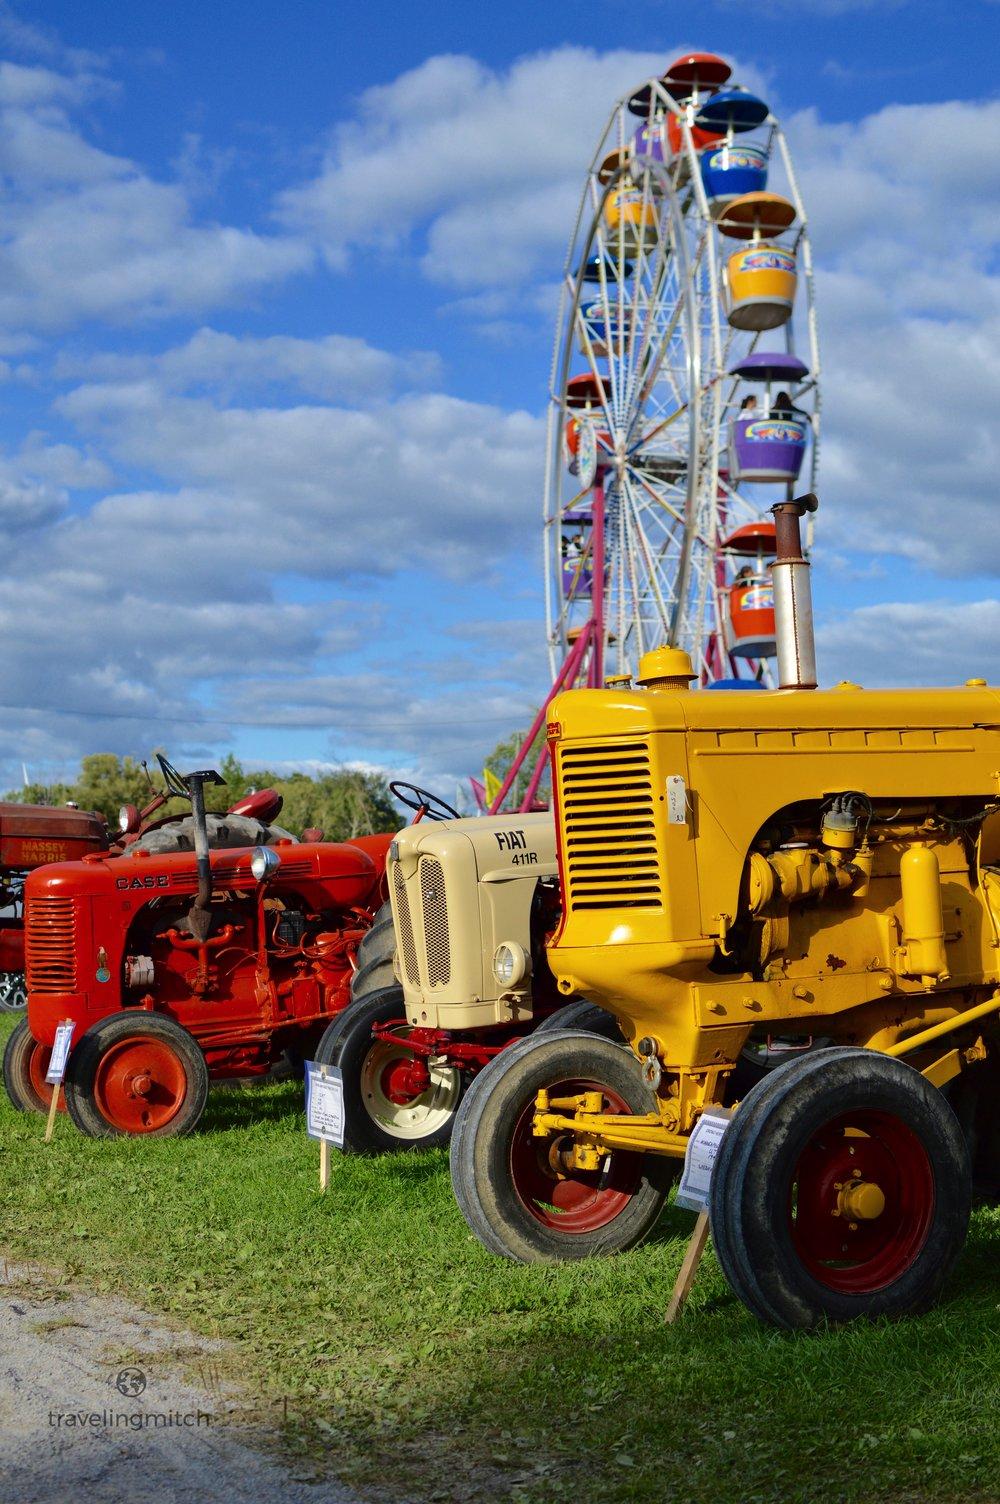 The 165 year old Orono Fair in Orono, Ontario